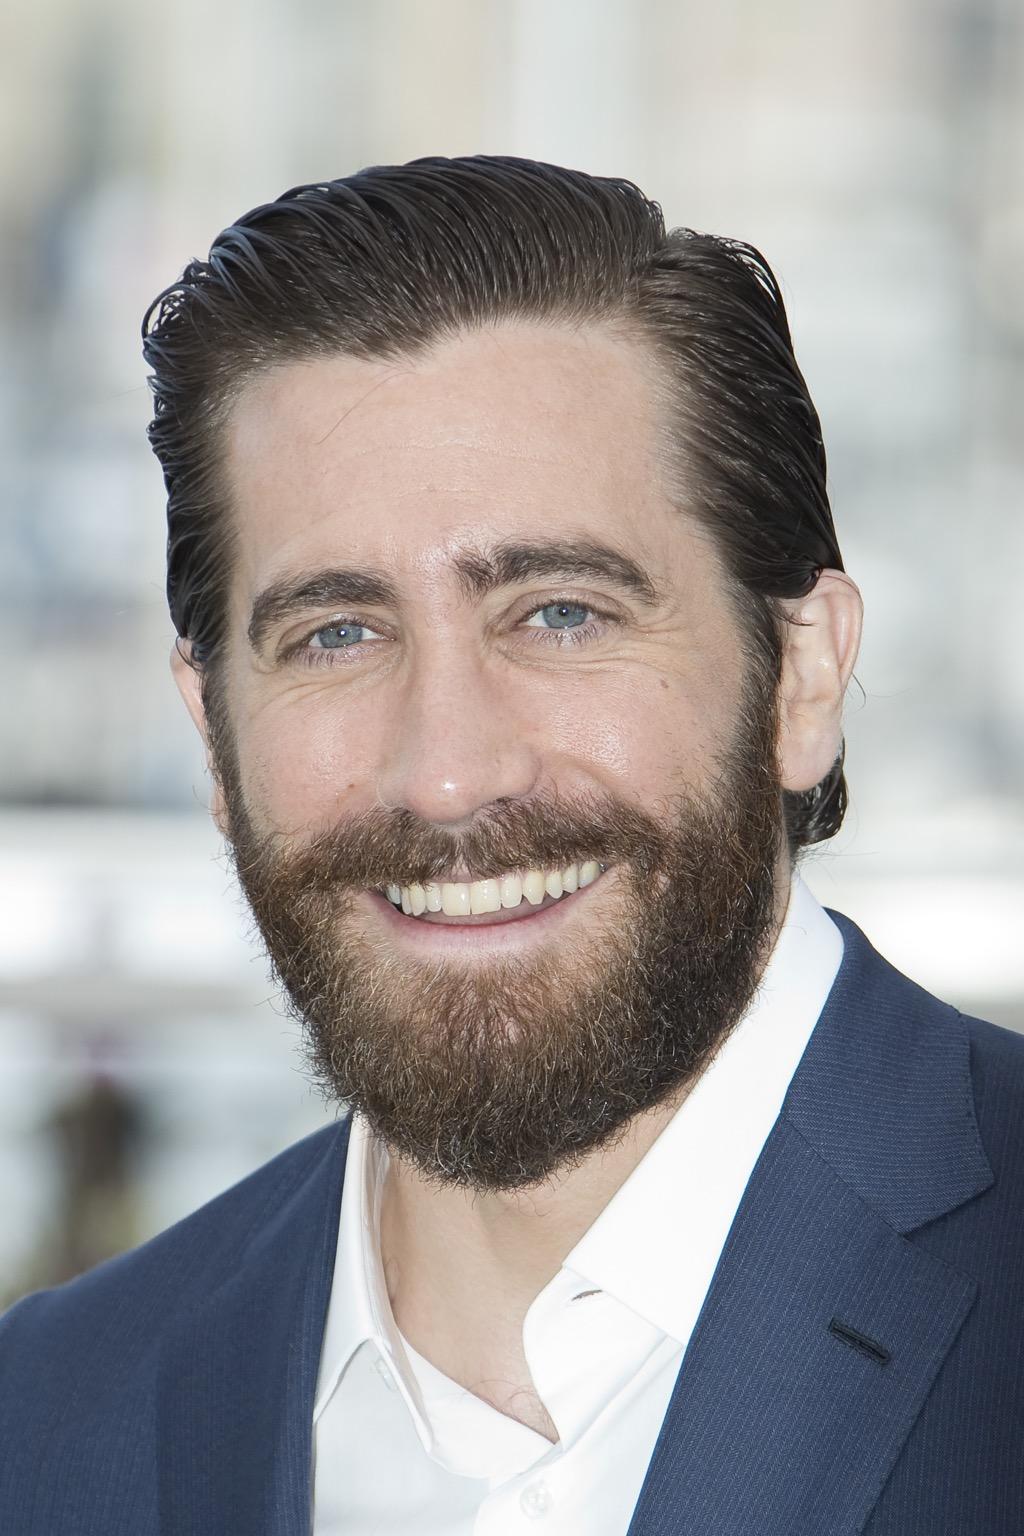 Jake Gyllenhaal misspelled celebrity names